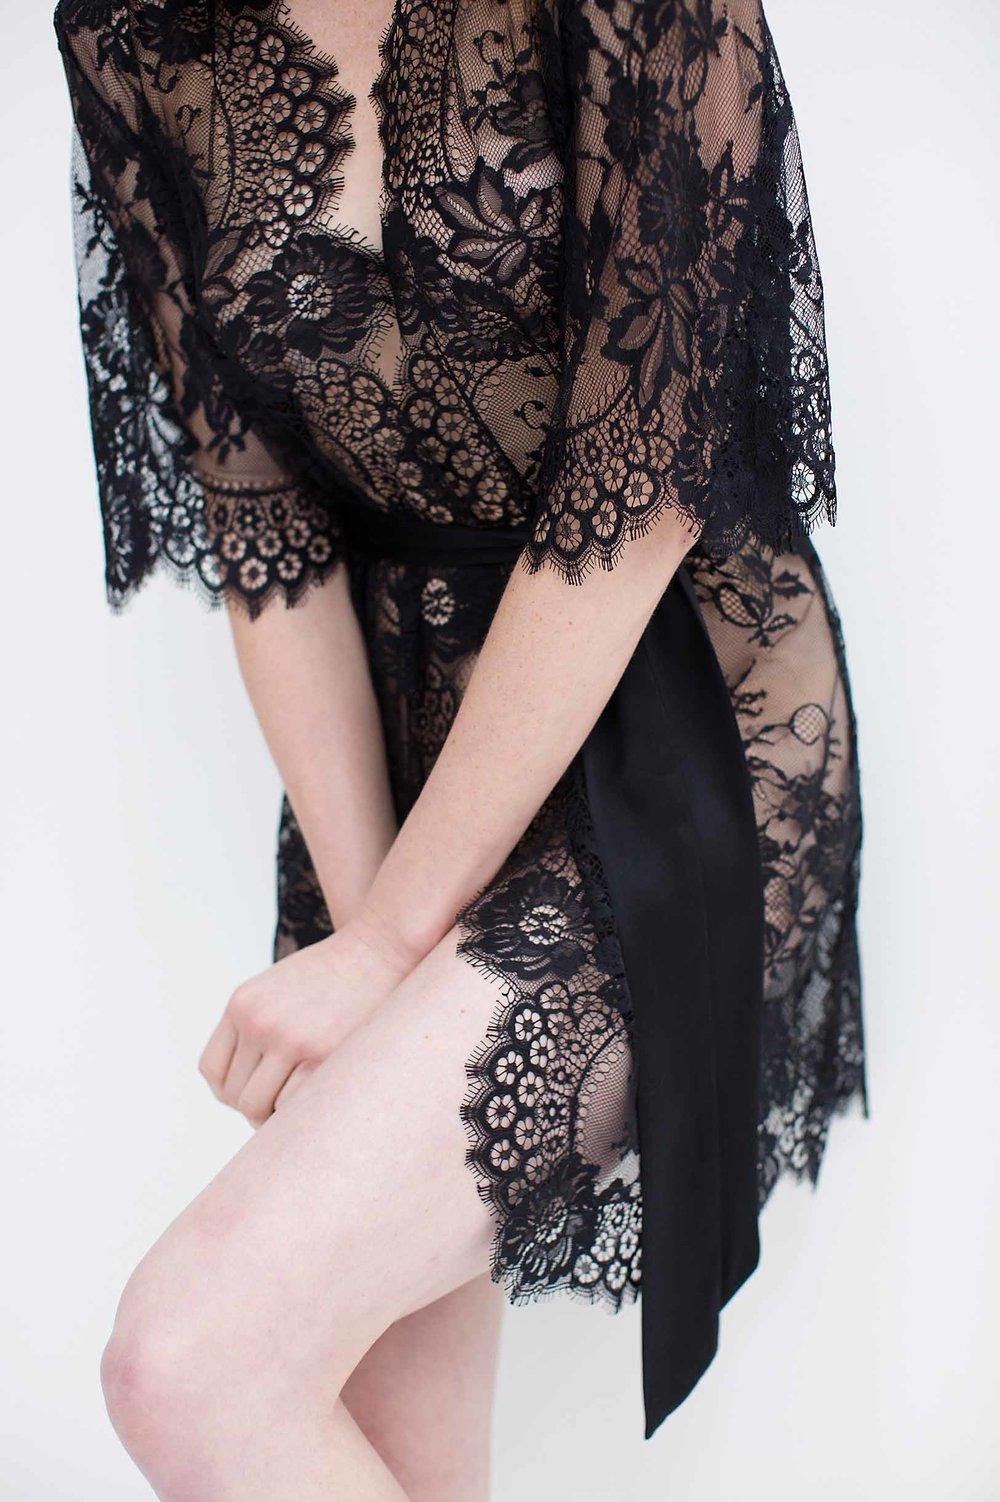 GirlandaSeriousDream Swan Queen lace robe black lingerie addict.jpg